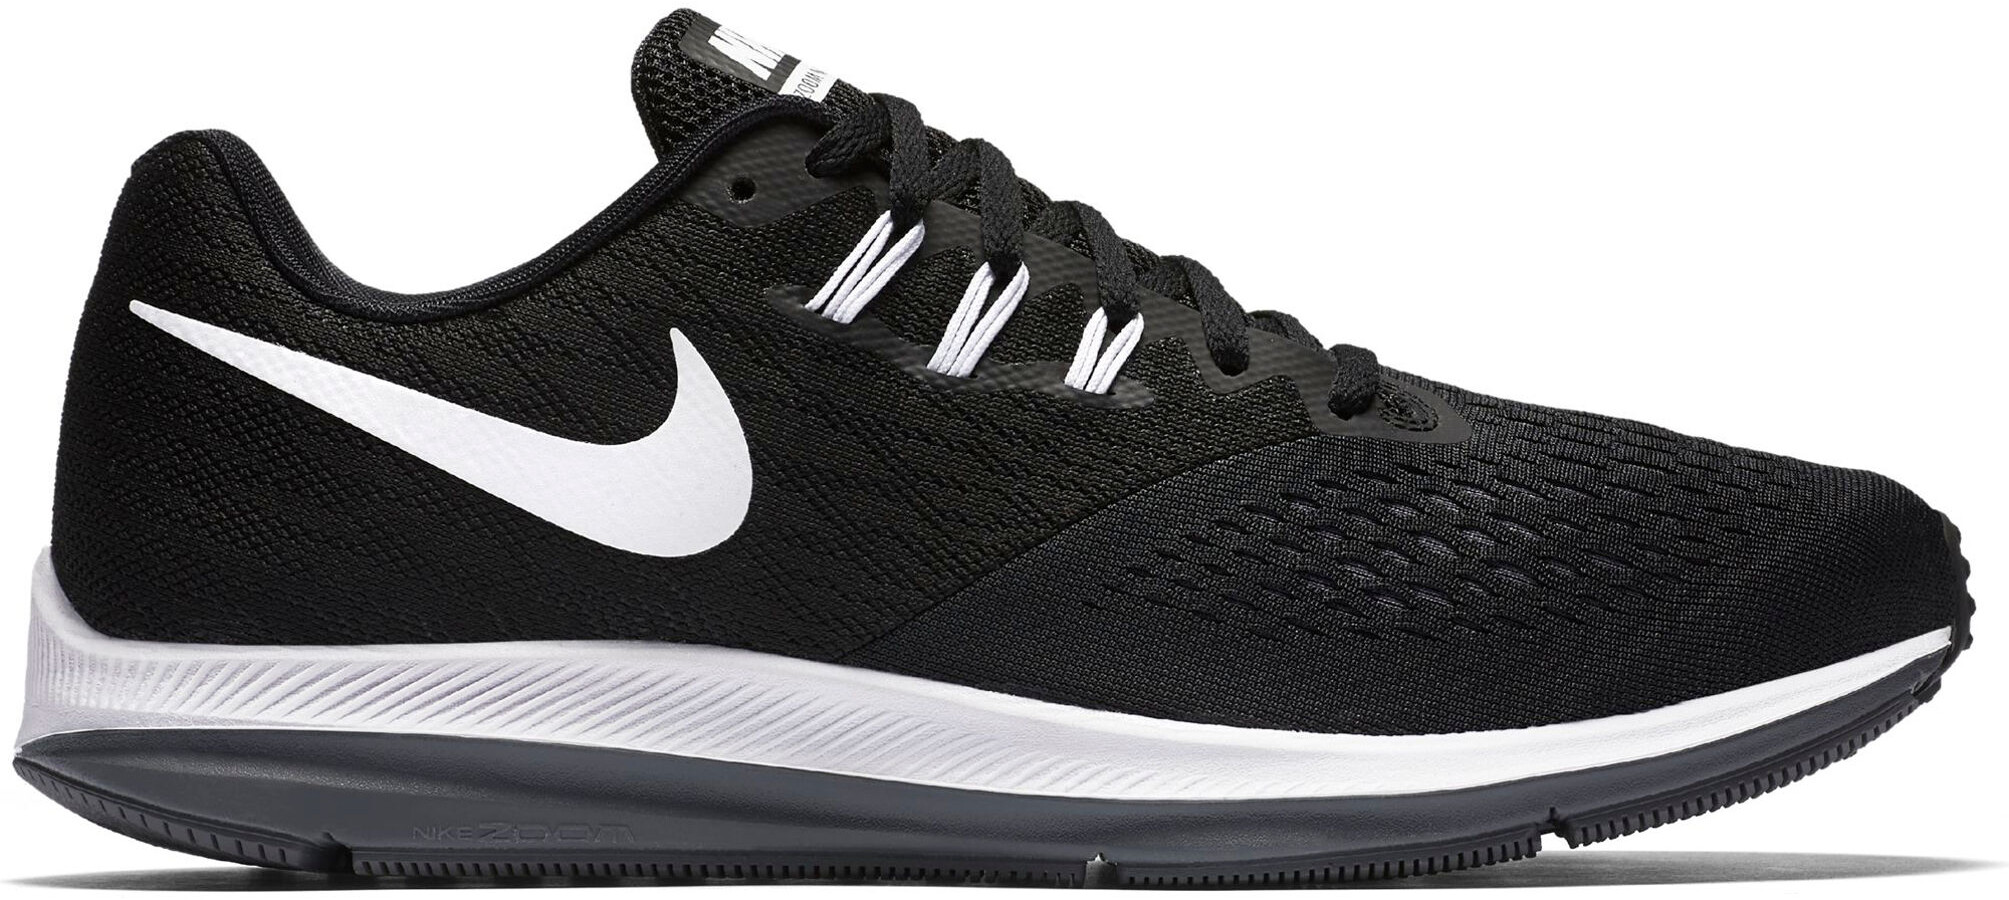 985f2b108d9 Nike Air Zoom Winflo 4 - Zapatillas running Hombre - negro